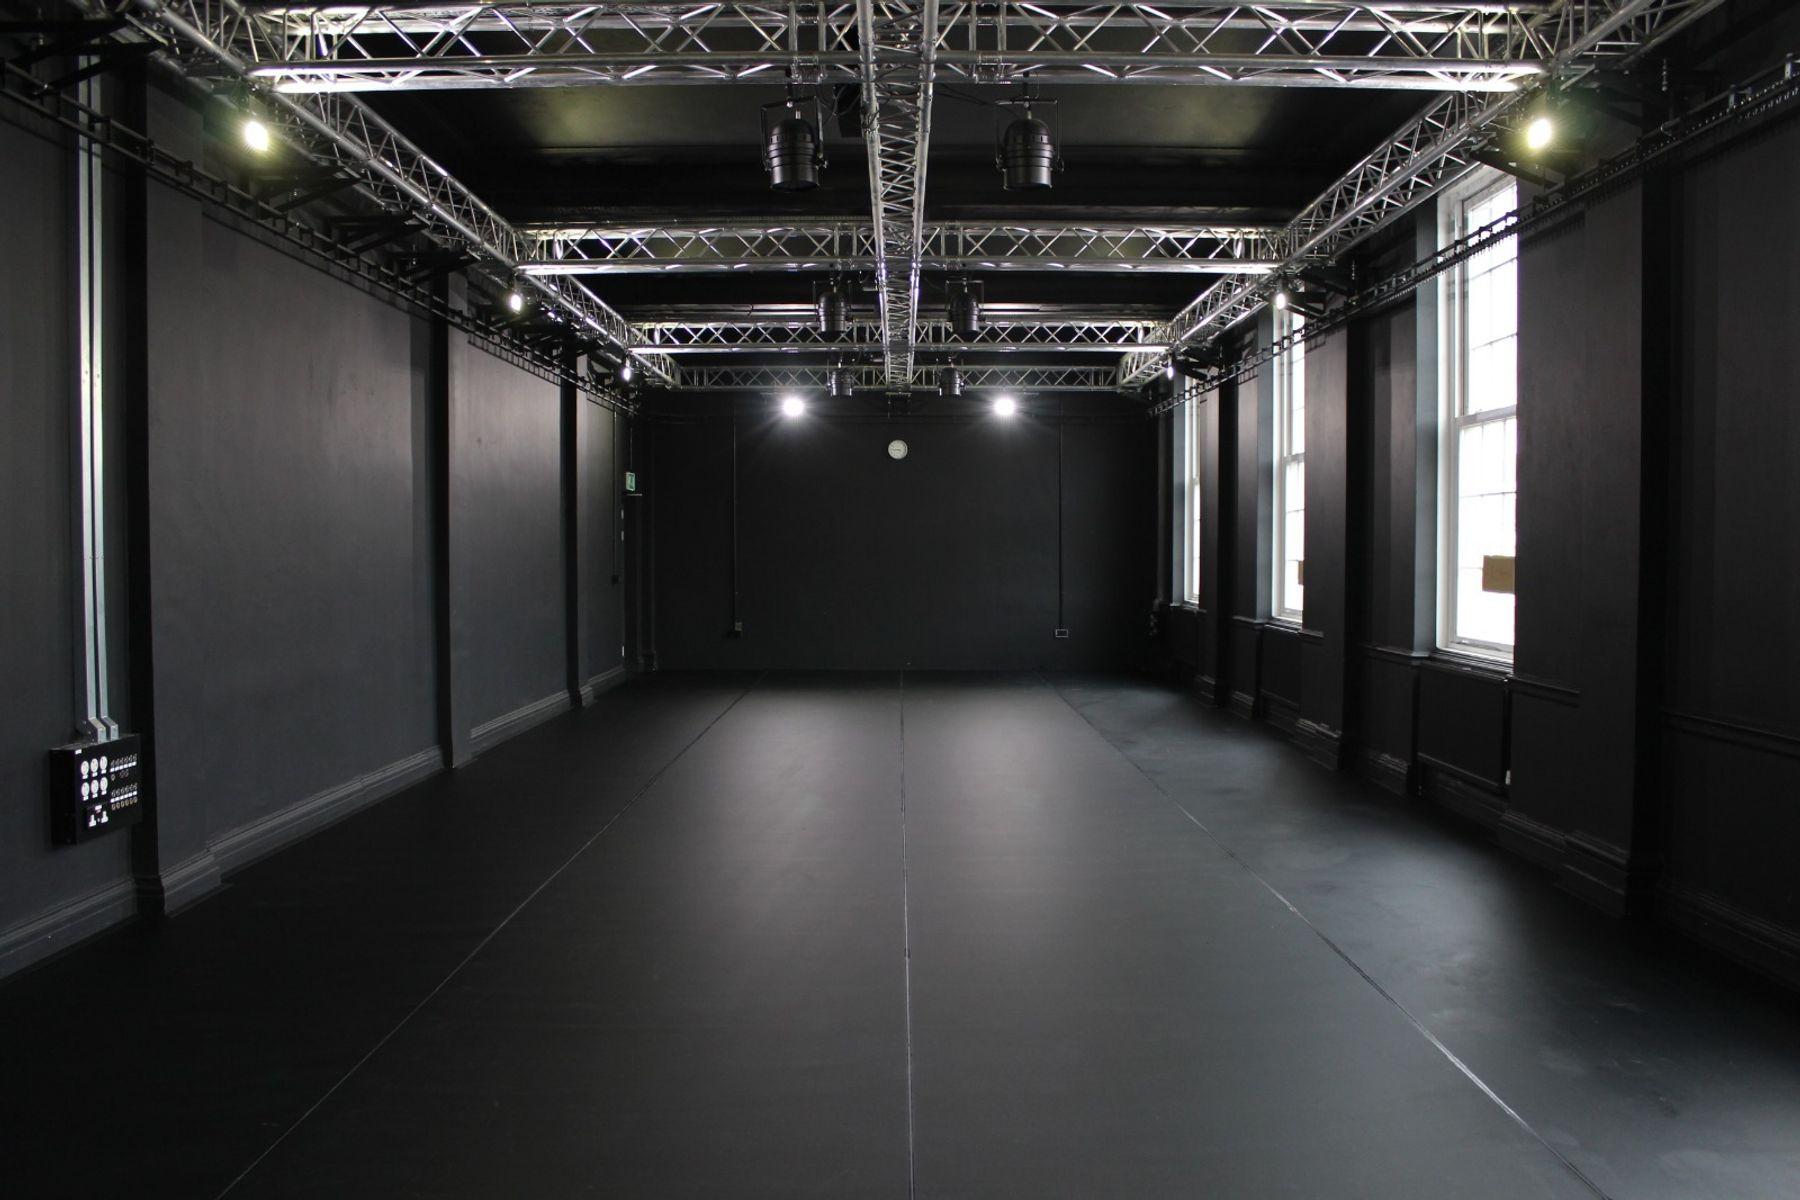 The Emrys John's Studio